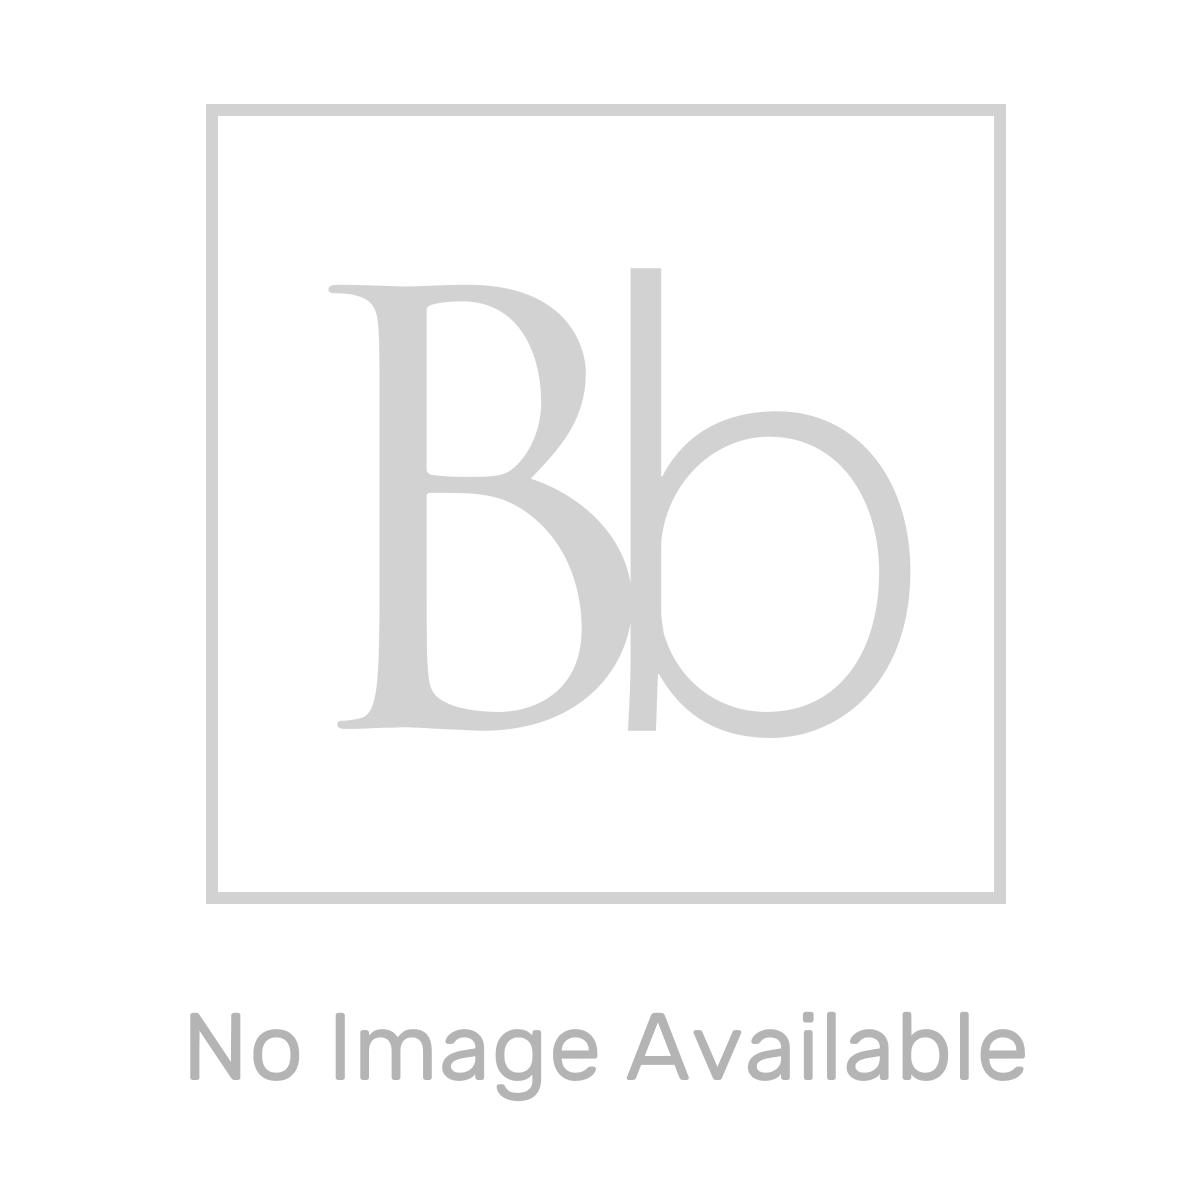 Sensio Apollo bluetooth LED mirror above a vanity unit